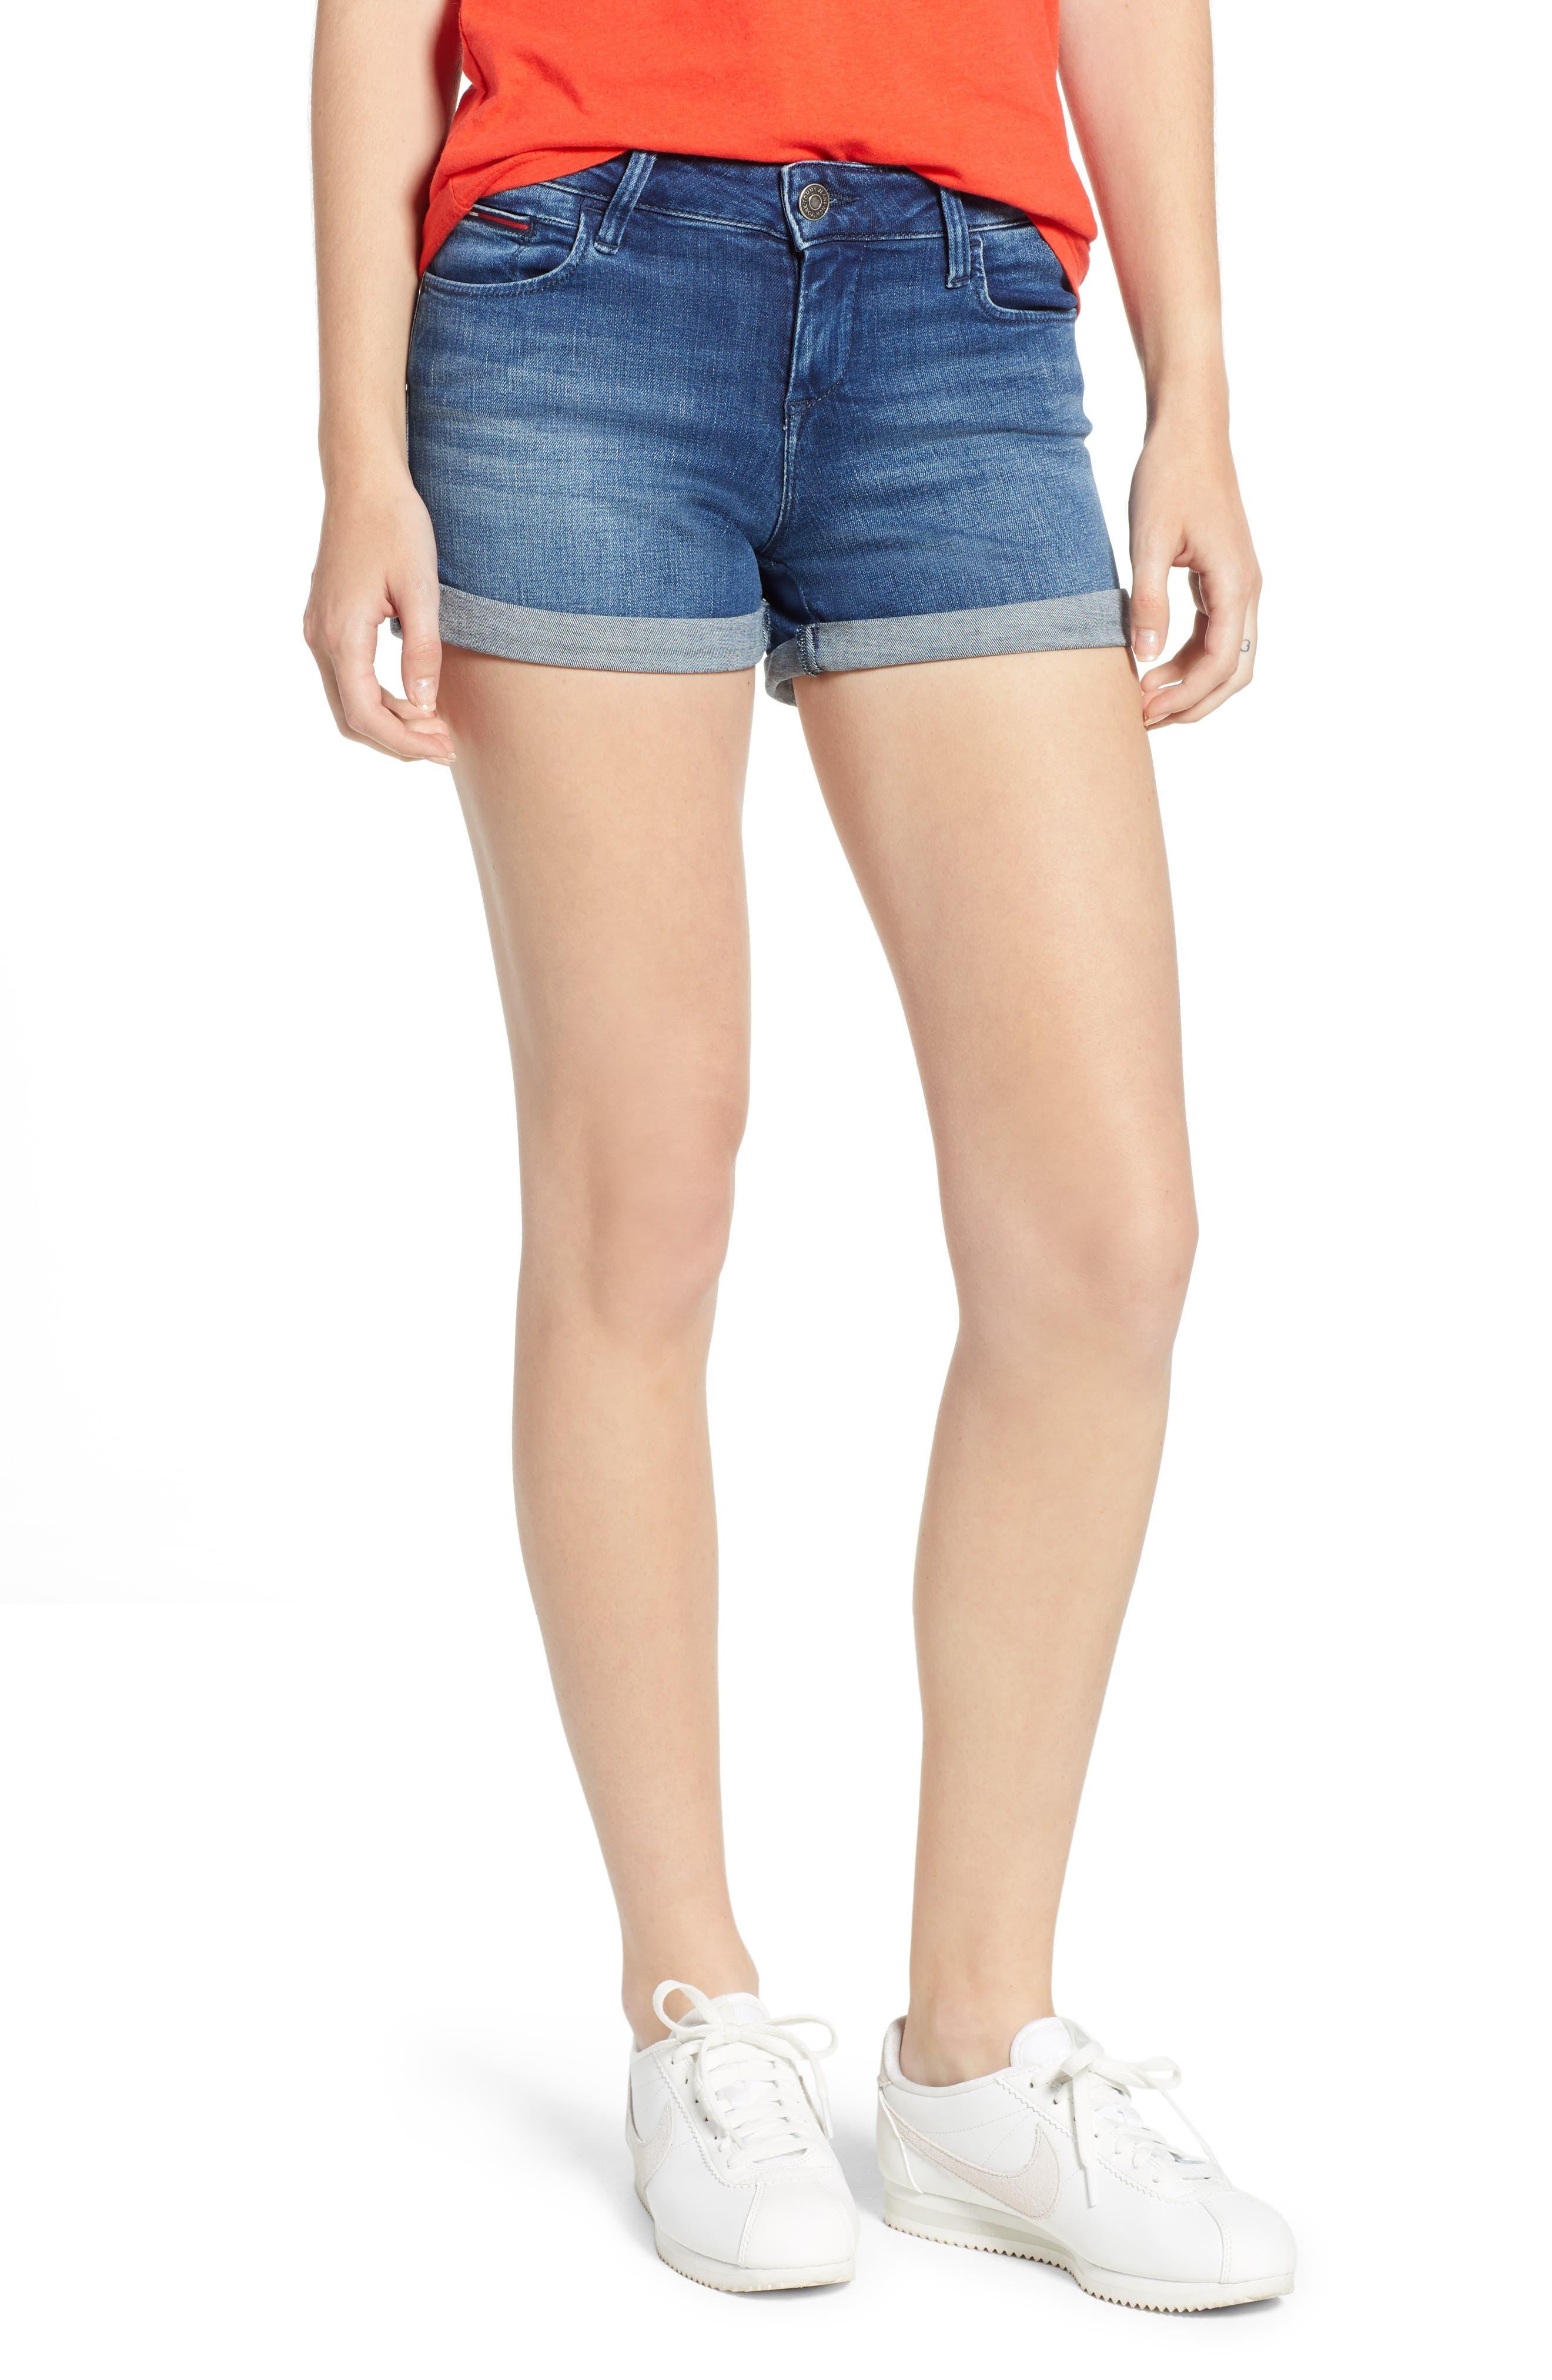 TJW Denim Shorts,                         Main,                         color, 400